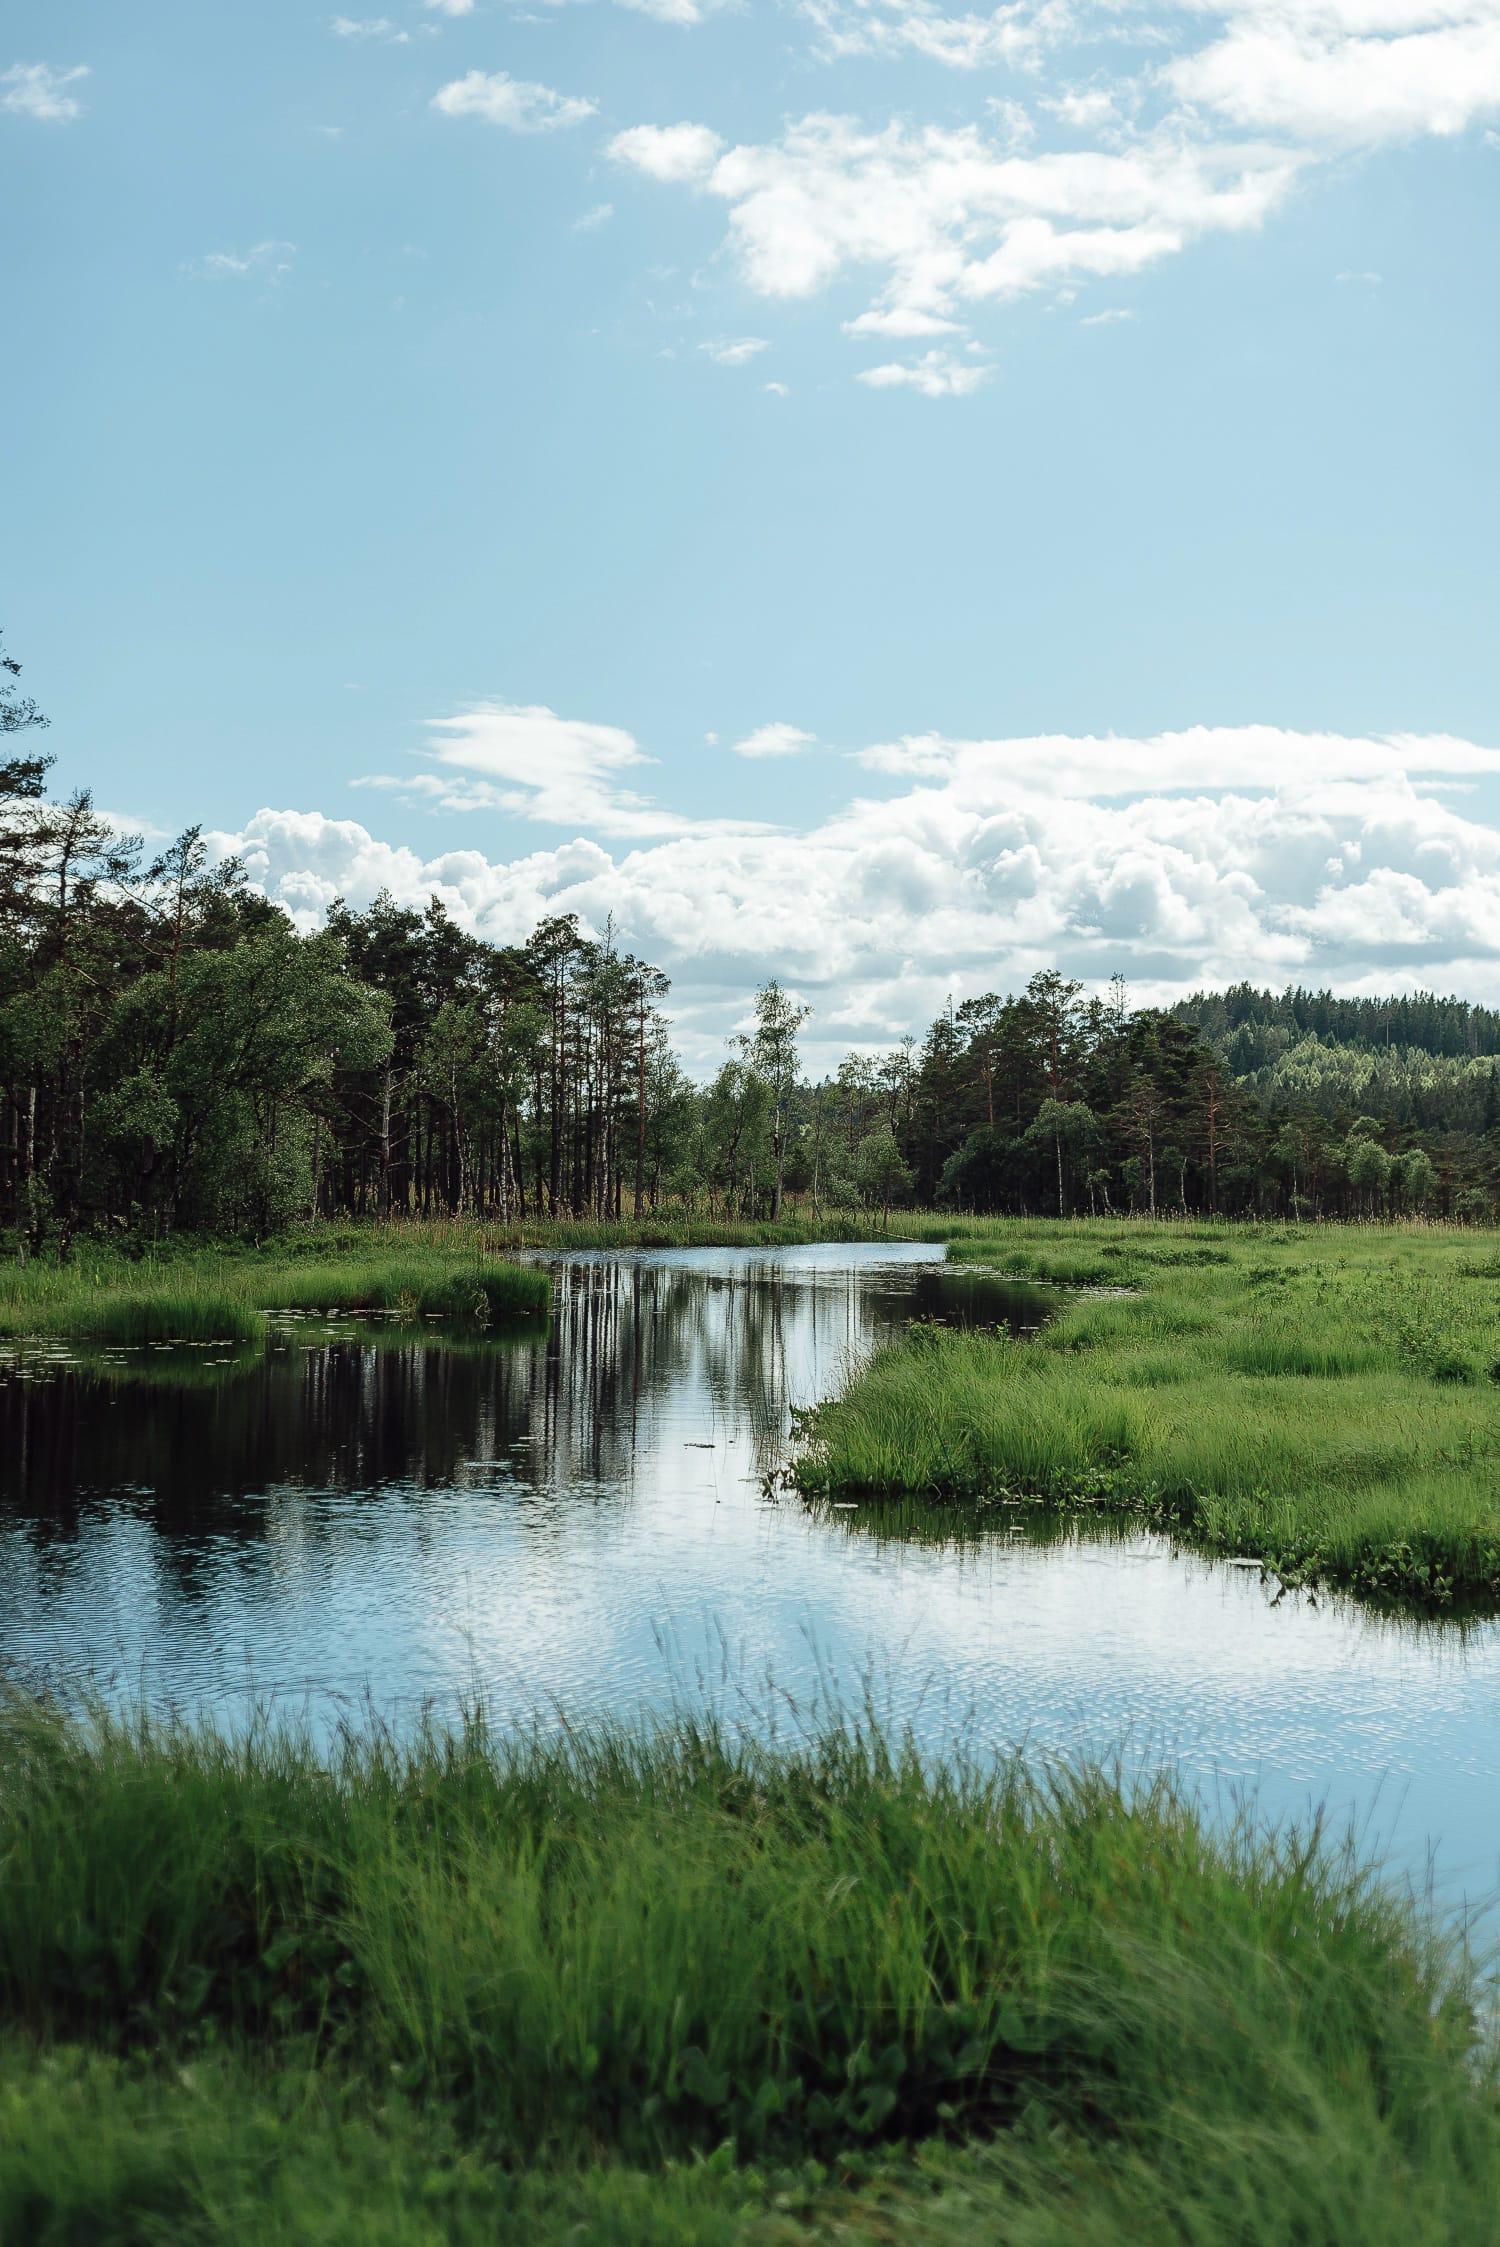 Vänga Mosse nature reserve | Photo © Rania Rönntoft | Northbound Journeys | www.northboundjourneys.comKvinnliga äventyrare Photo © Rania Rönntoft | Northbound Journeys | www.northboundjourneys.com